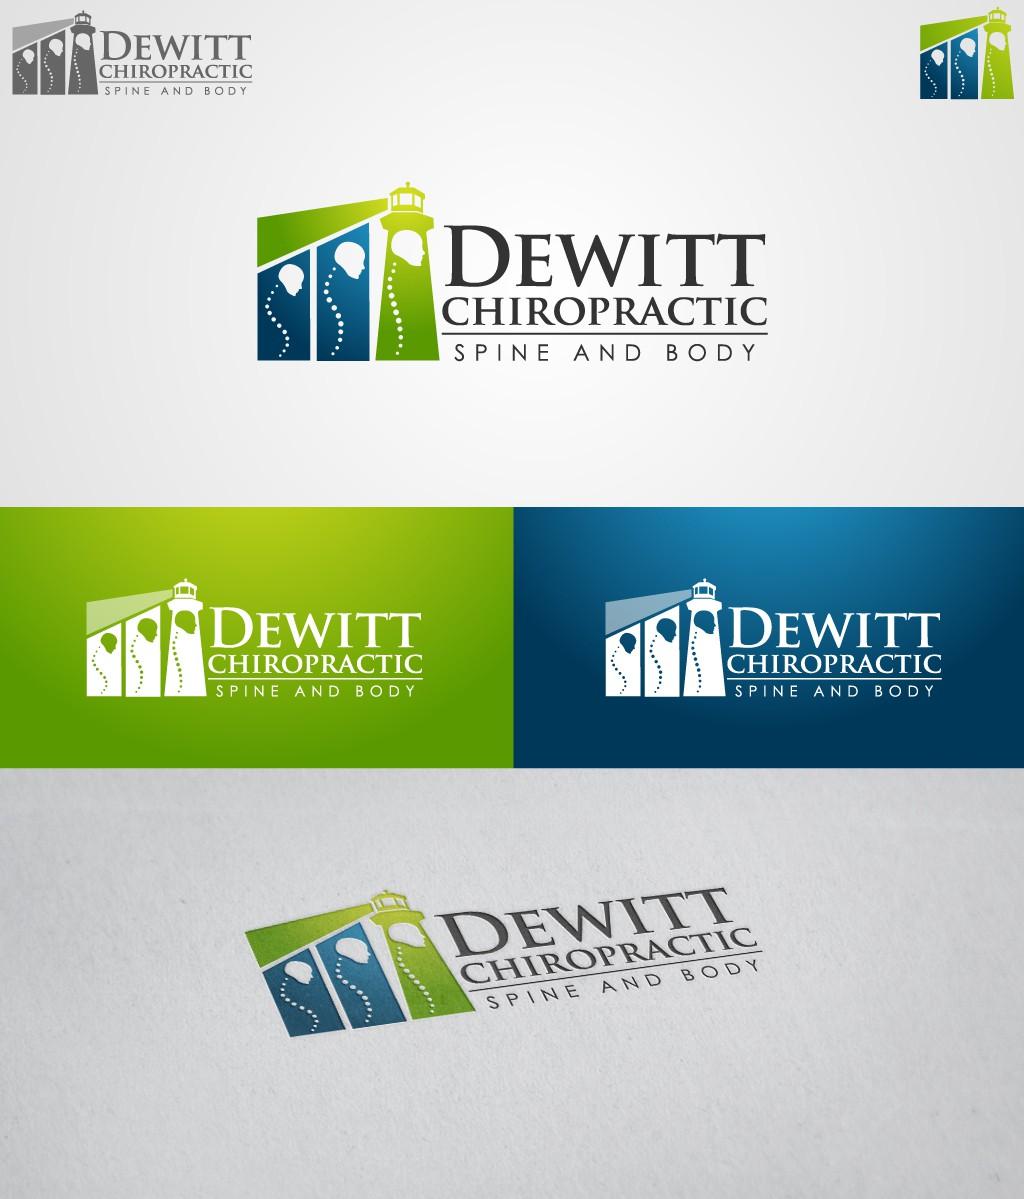 DeWitt Chiropractic   Spine & Body needs a new logo